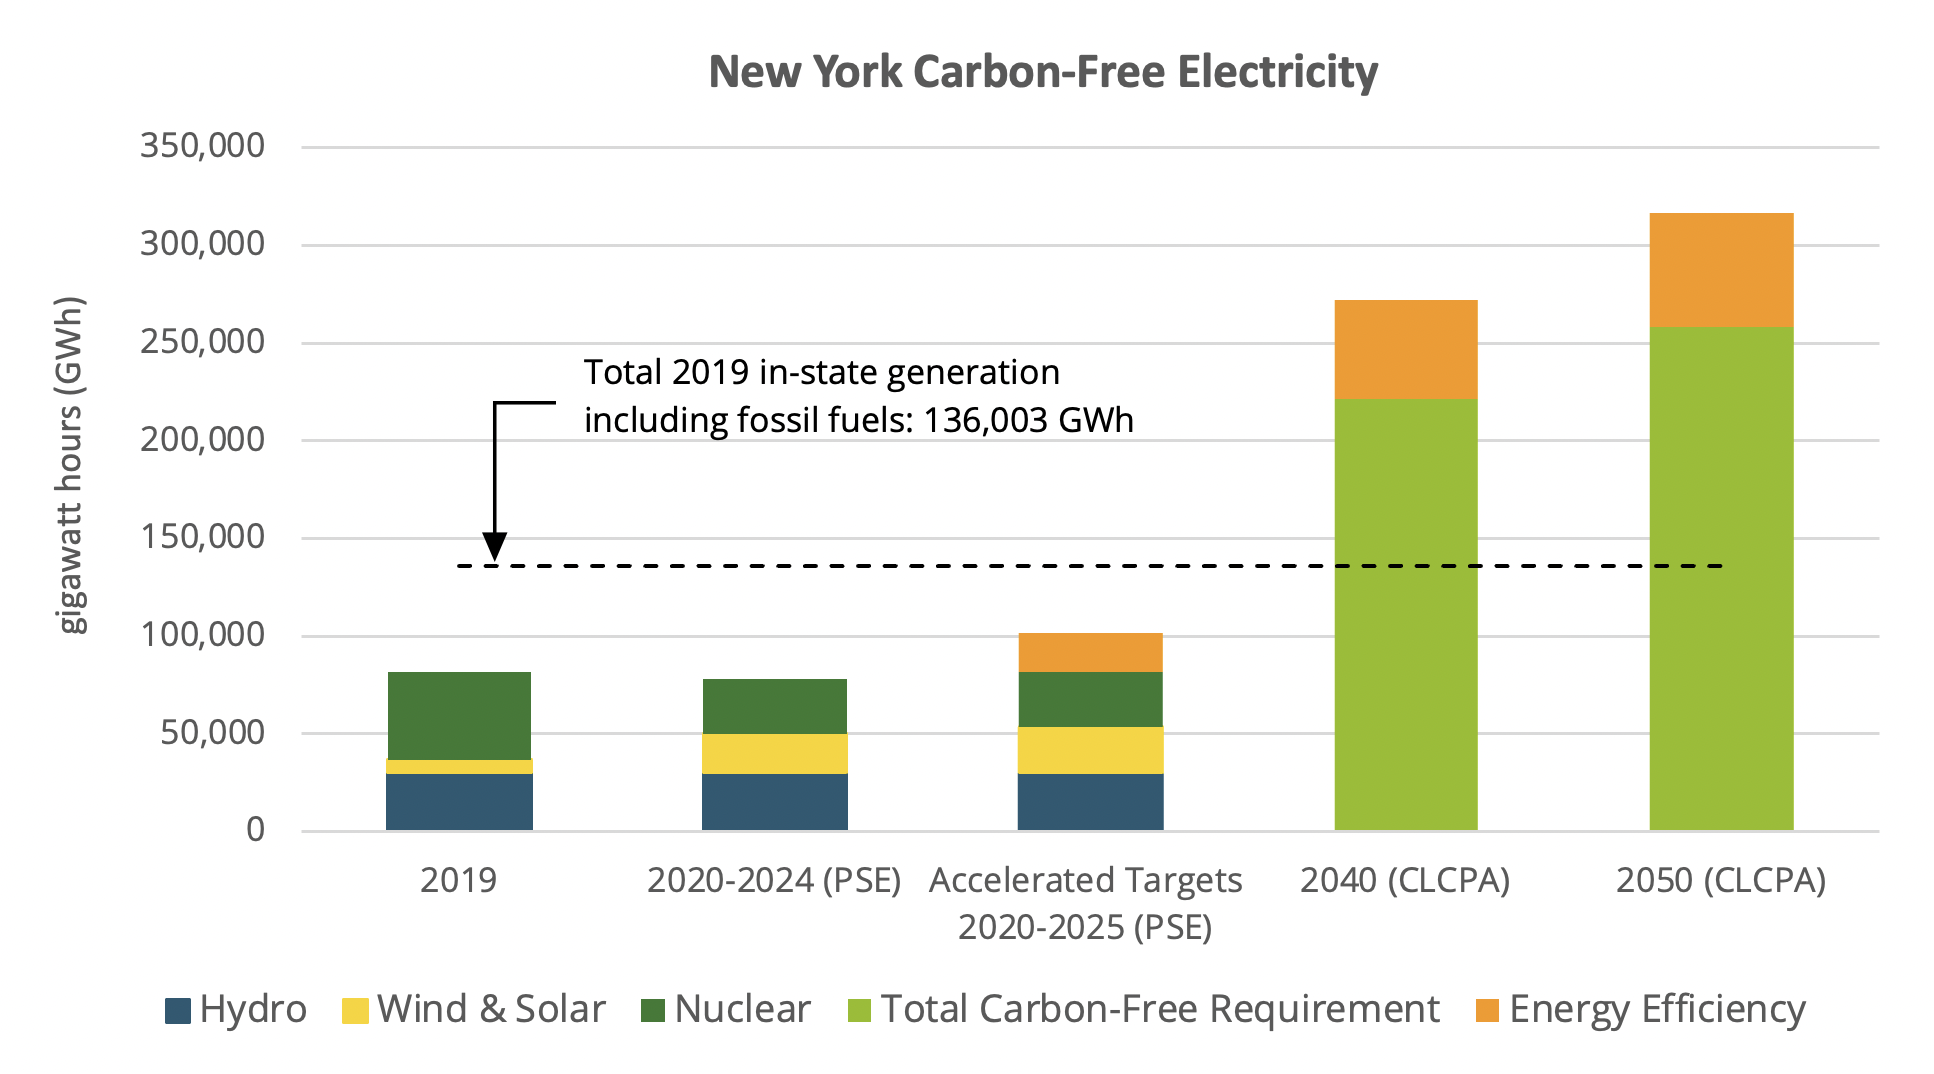 NY CLCPA Electricity Needs